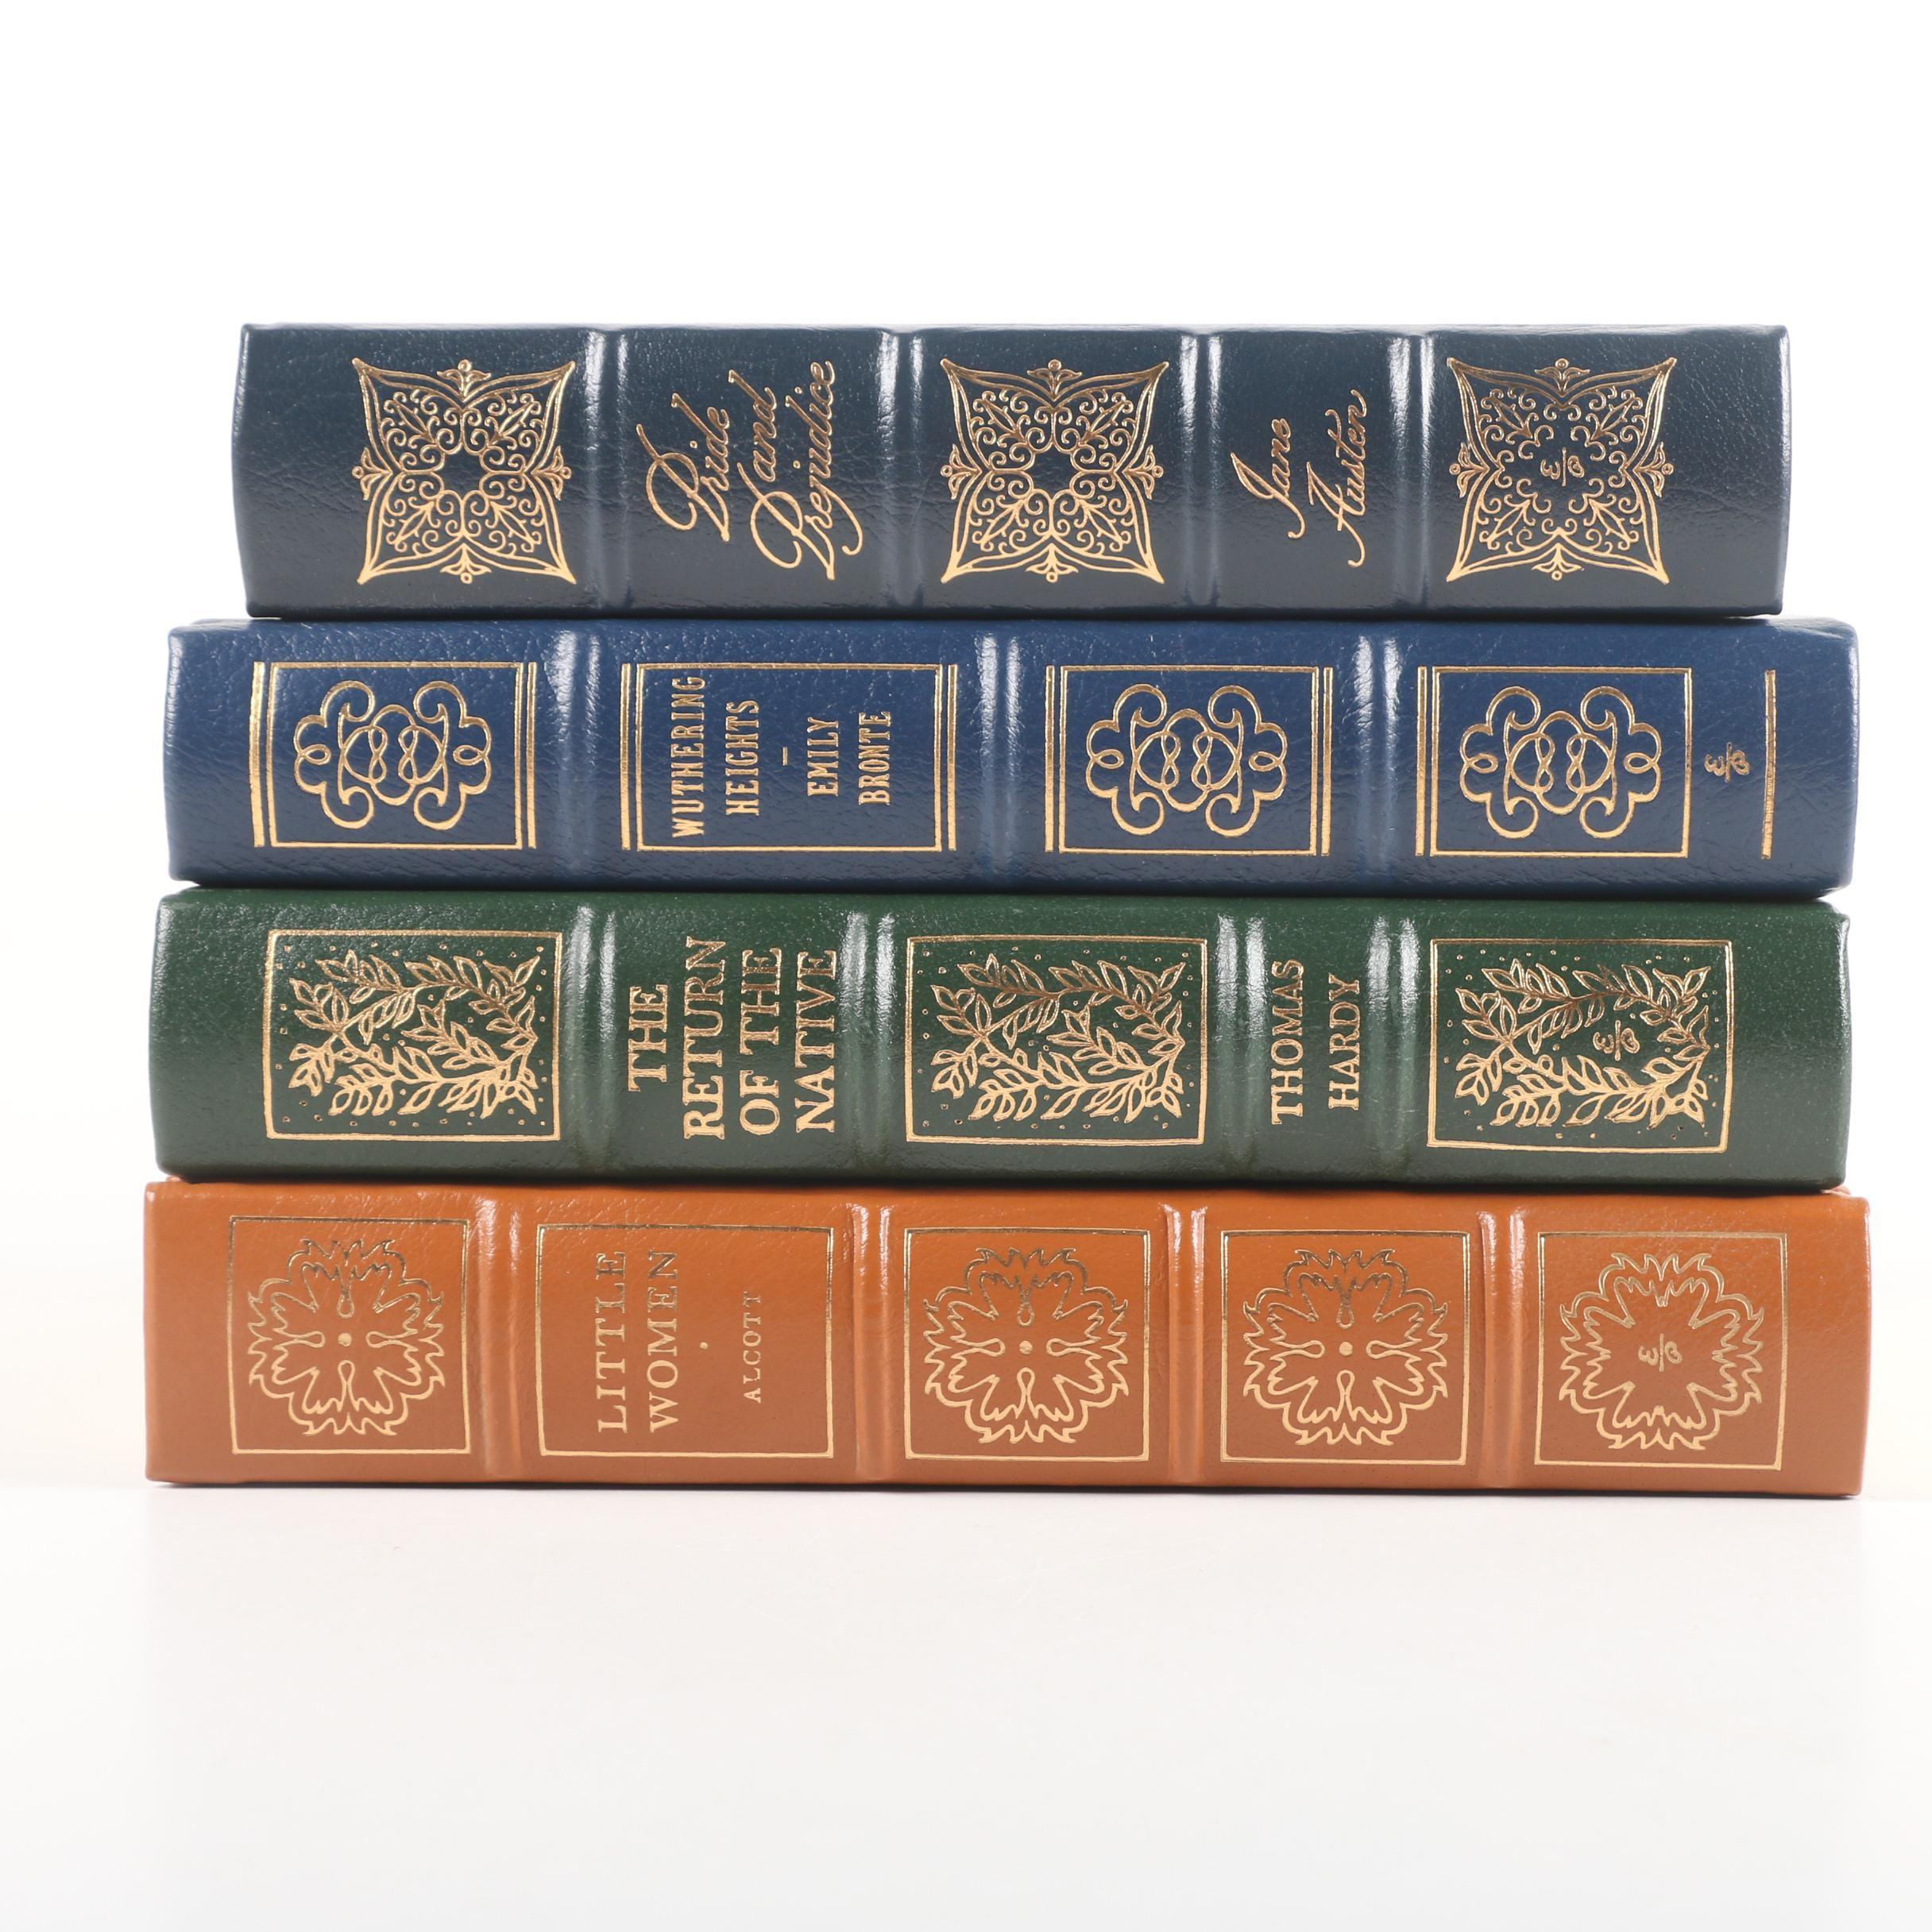 "Easton Press Classics including Jane Austen's ""Pride and Prejudice"""